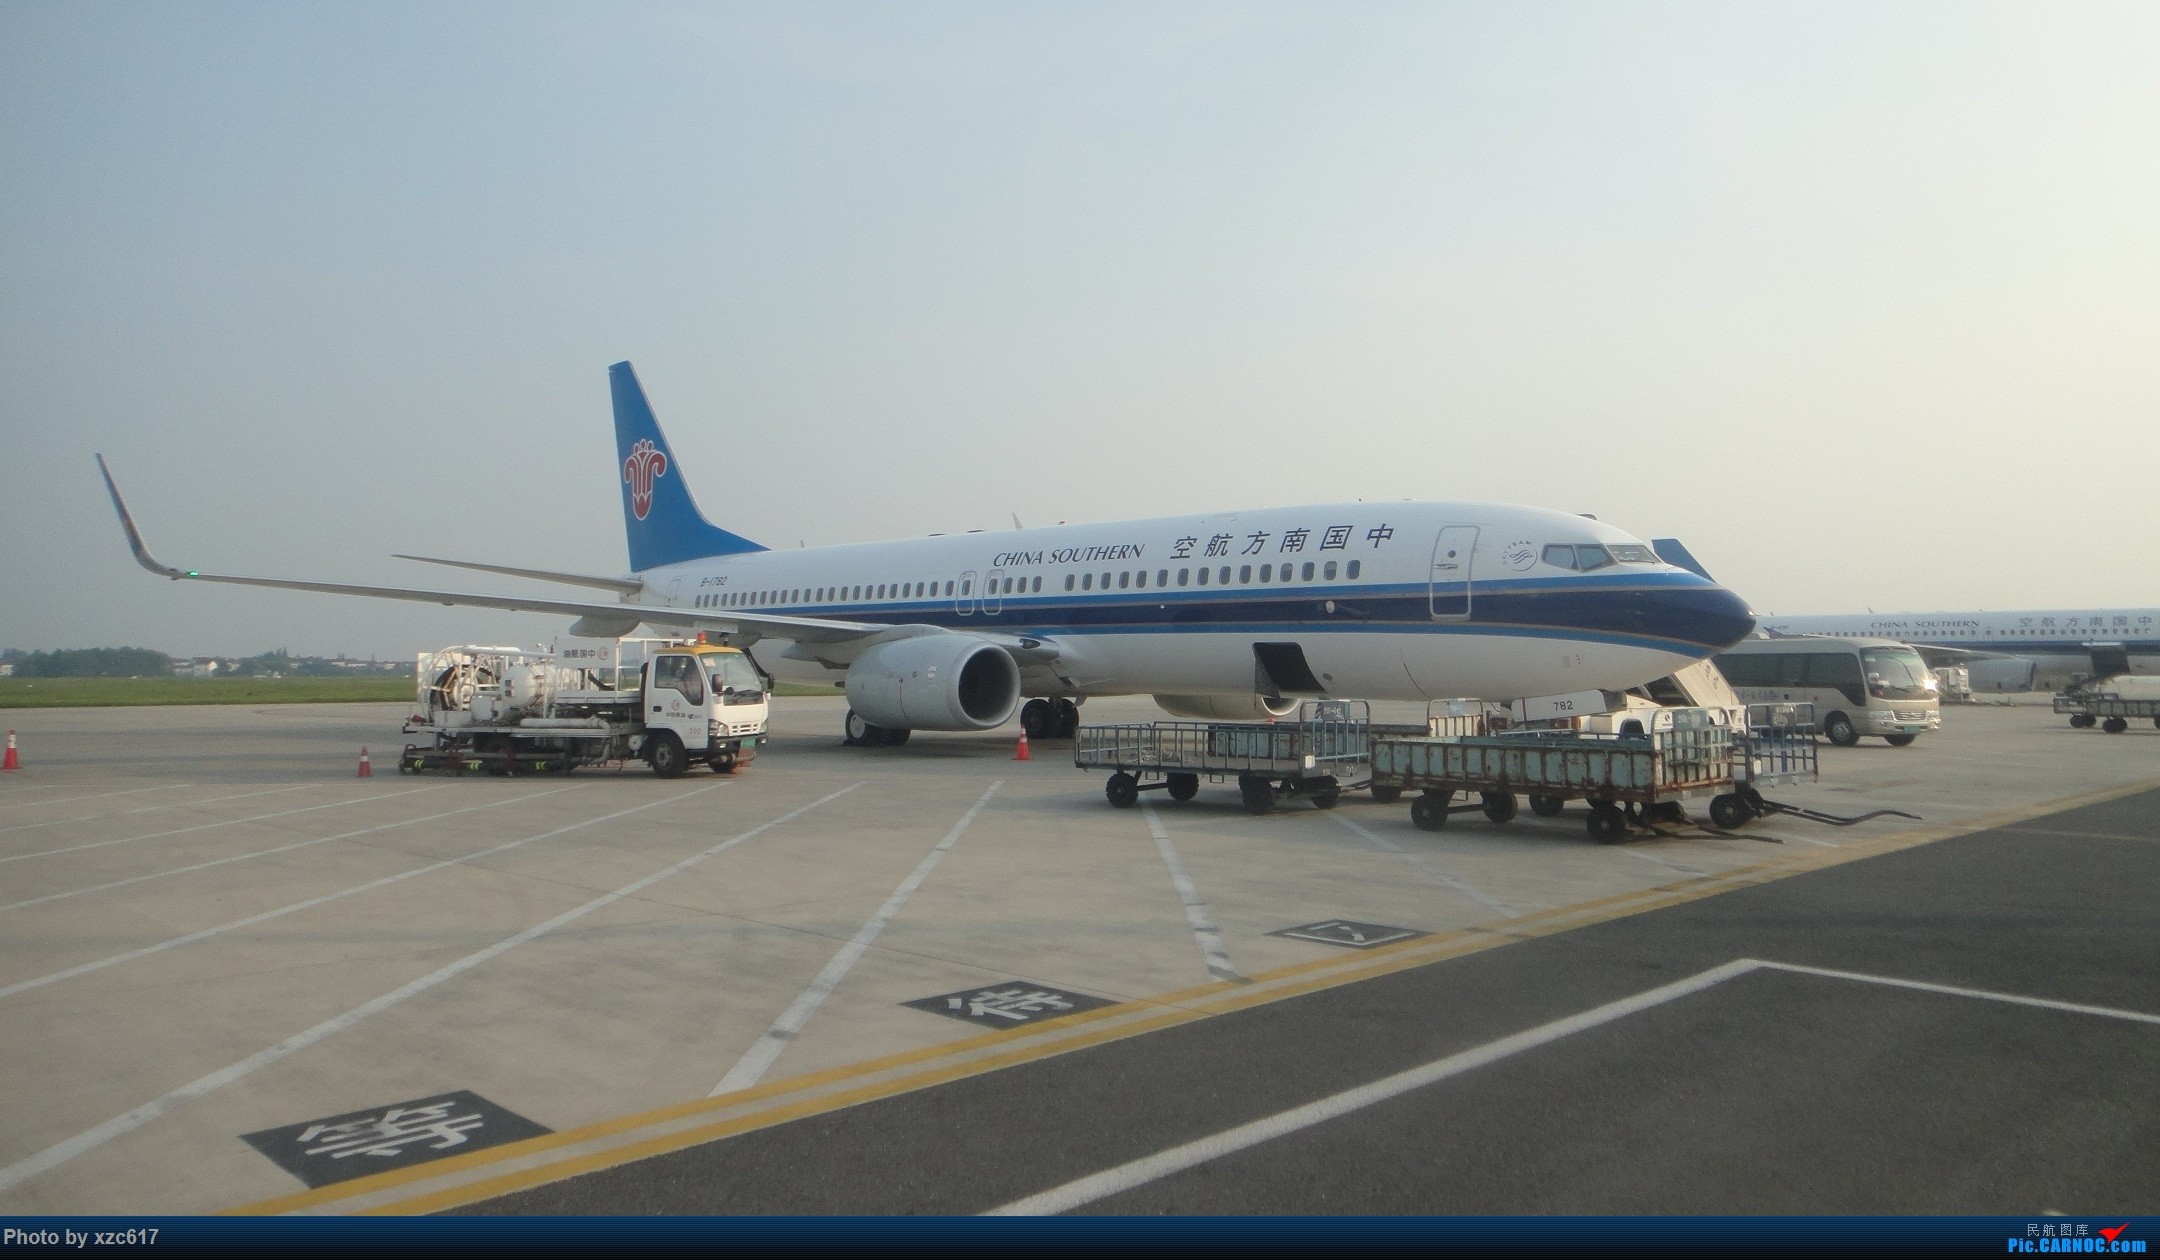 Re:[原创]xzc617的飞行游记 NO.1 由扬州到大连,平生第一次游海岛 BOEING 737-800 B-1782 中国南京禄口国际机场